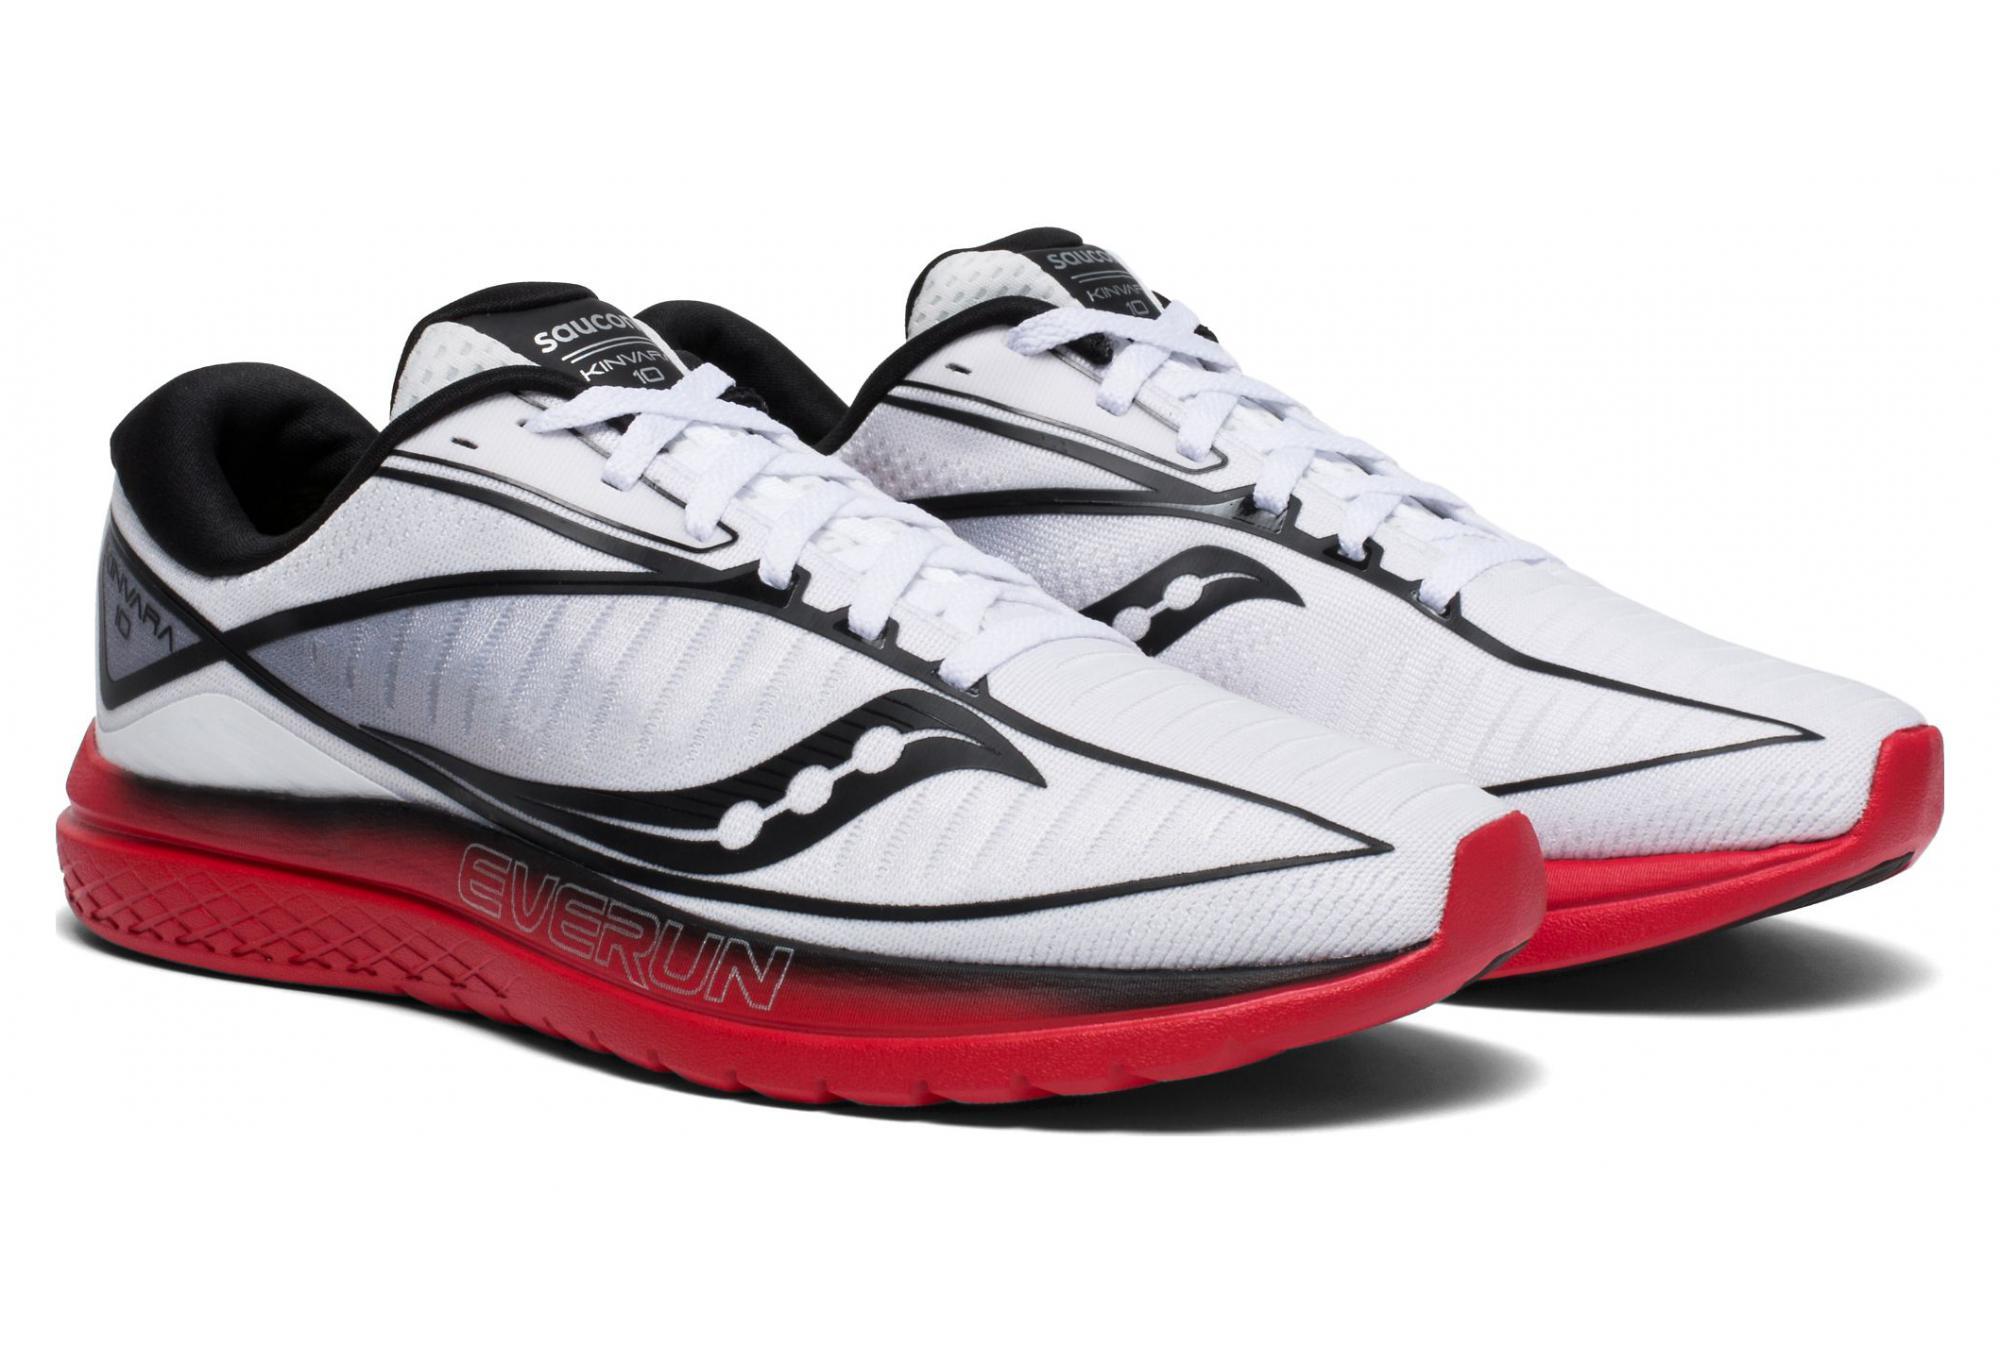 saucony kinvara 3 hombre zapatos